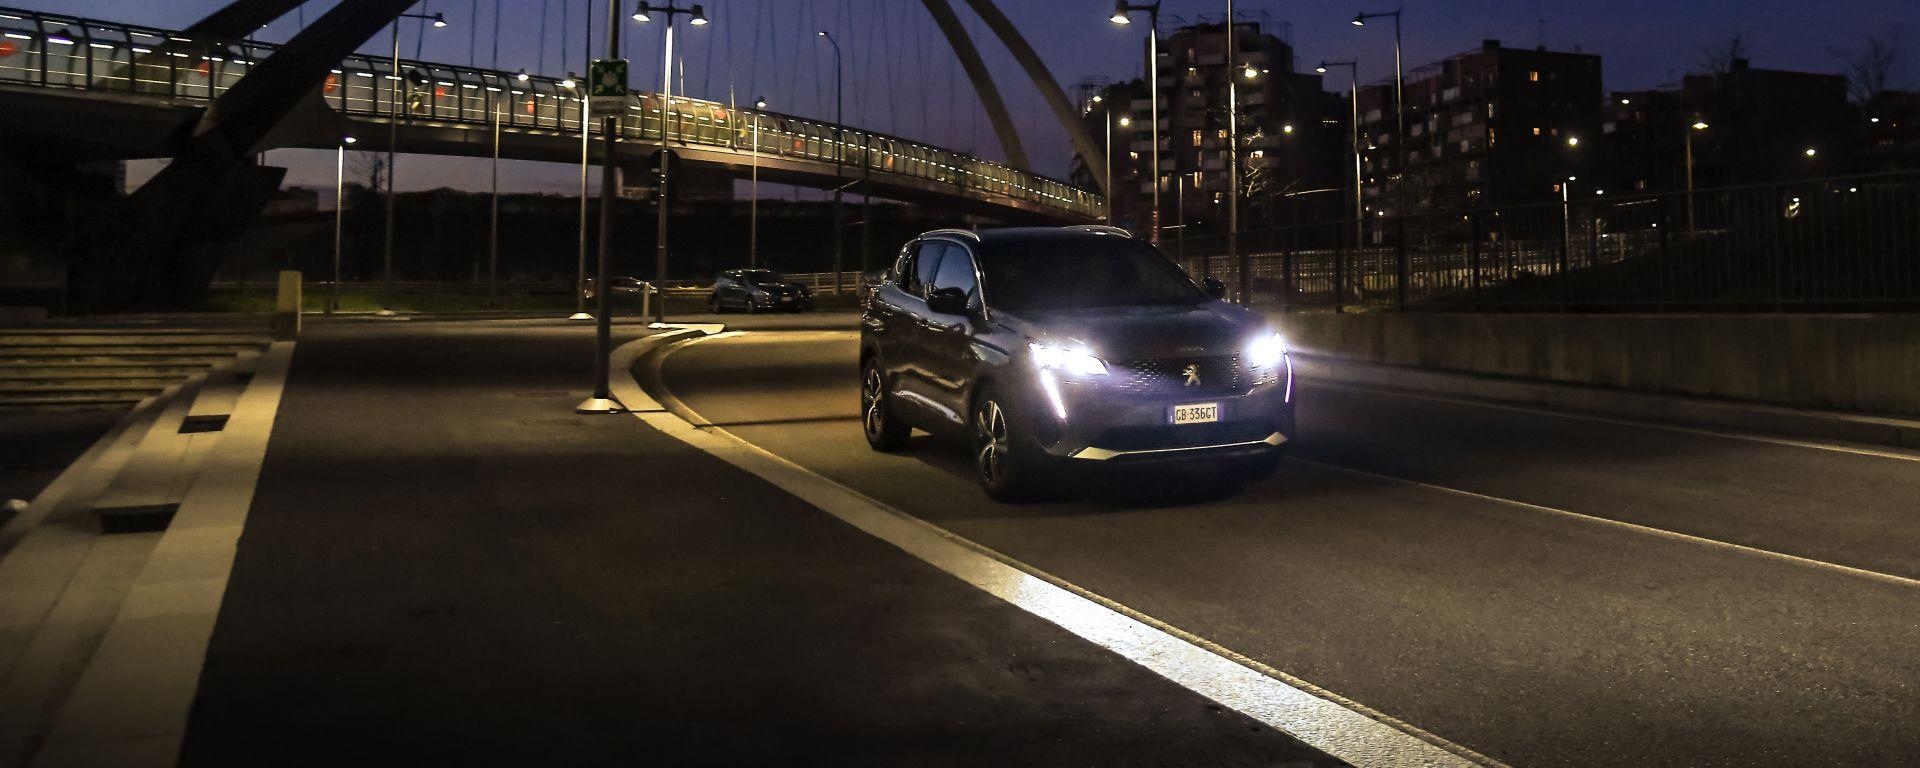 Peugeot 3008, prova della visione notturna Night Vision